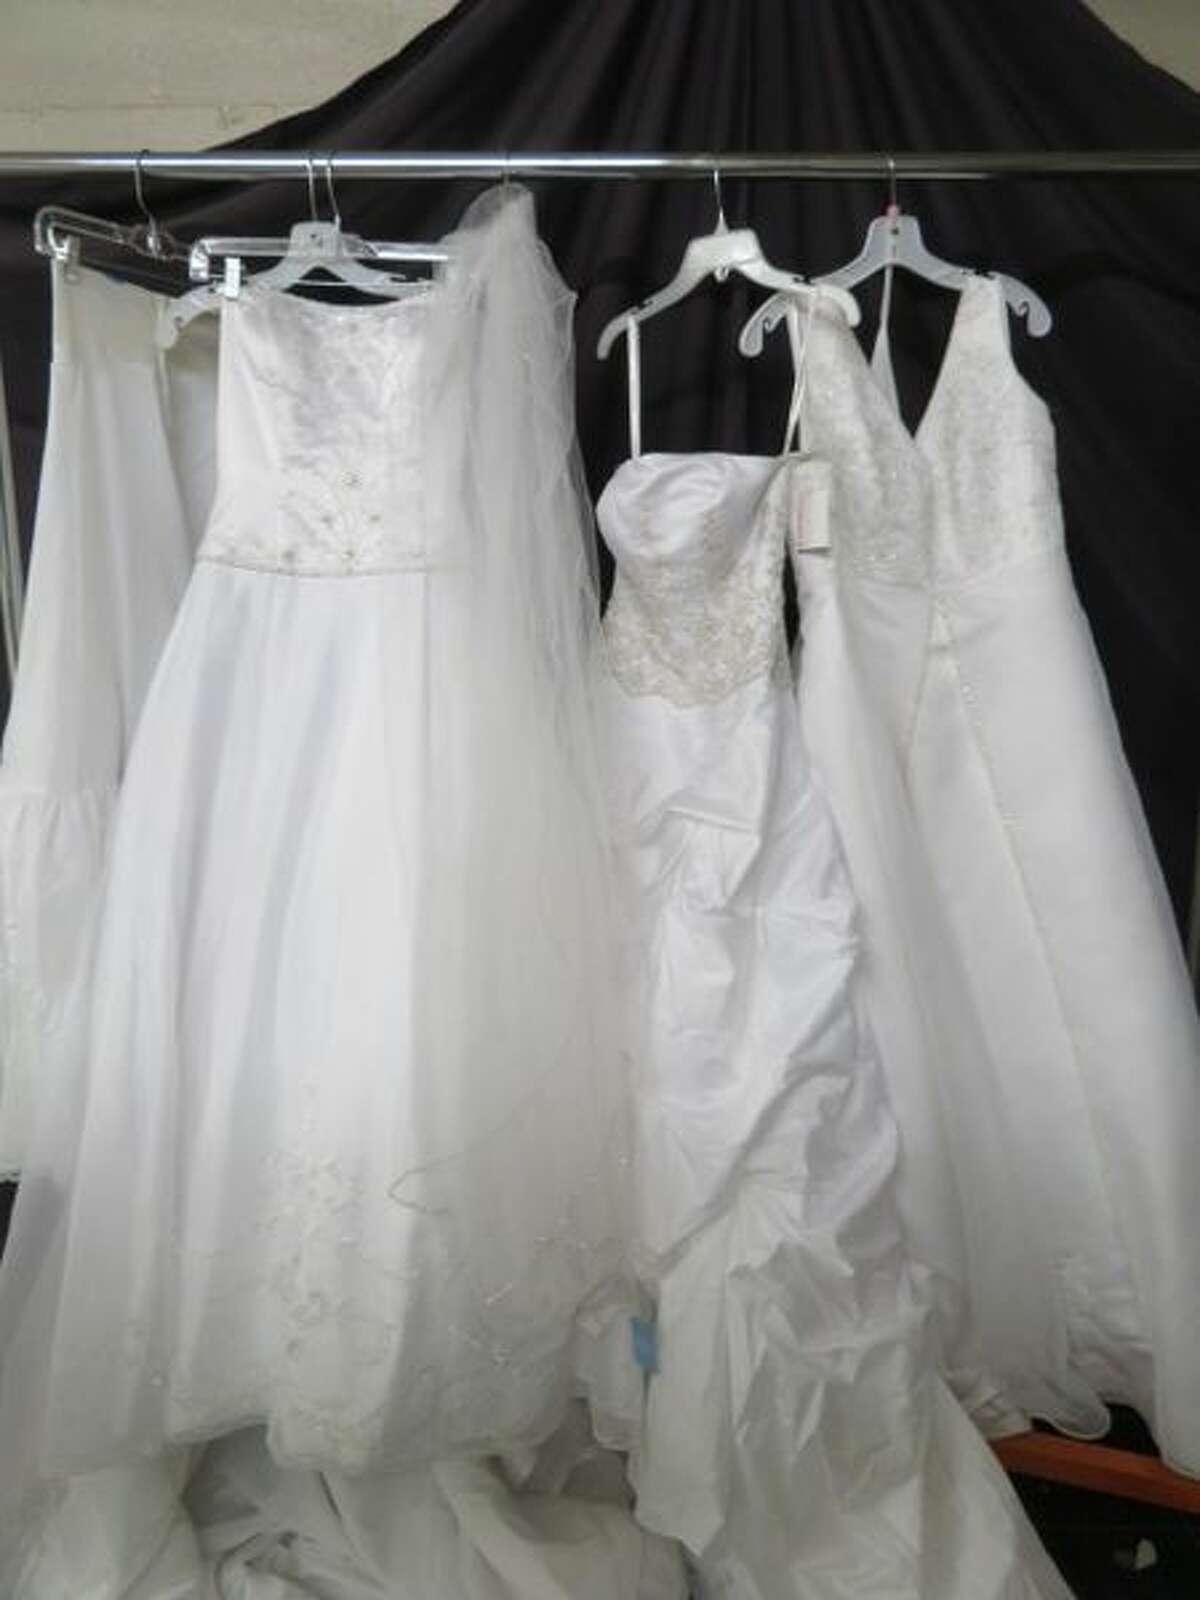 Wedding Dresses Grab Lot #14 Current Price: $52.00